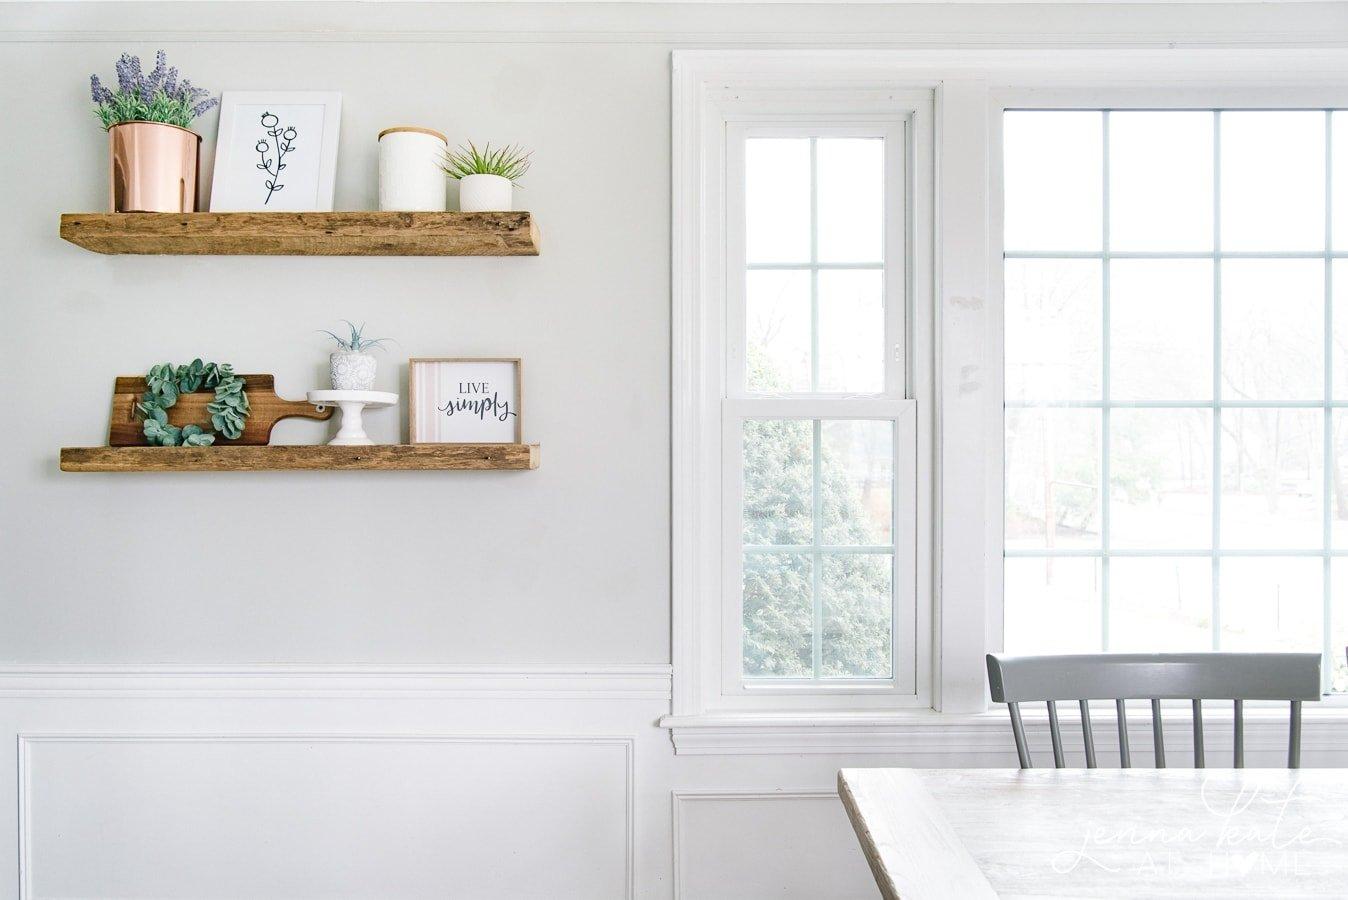 repose gray kitchen